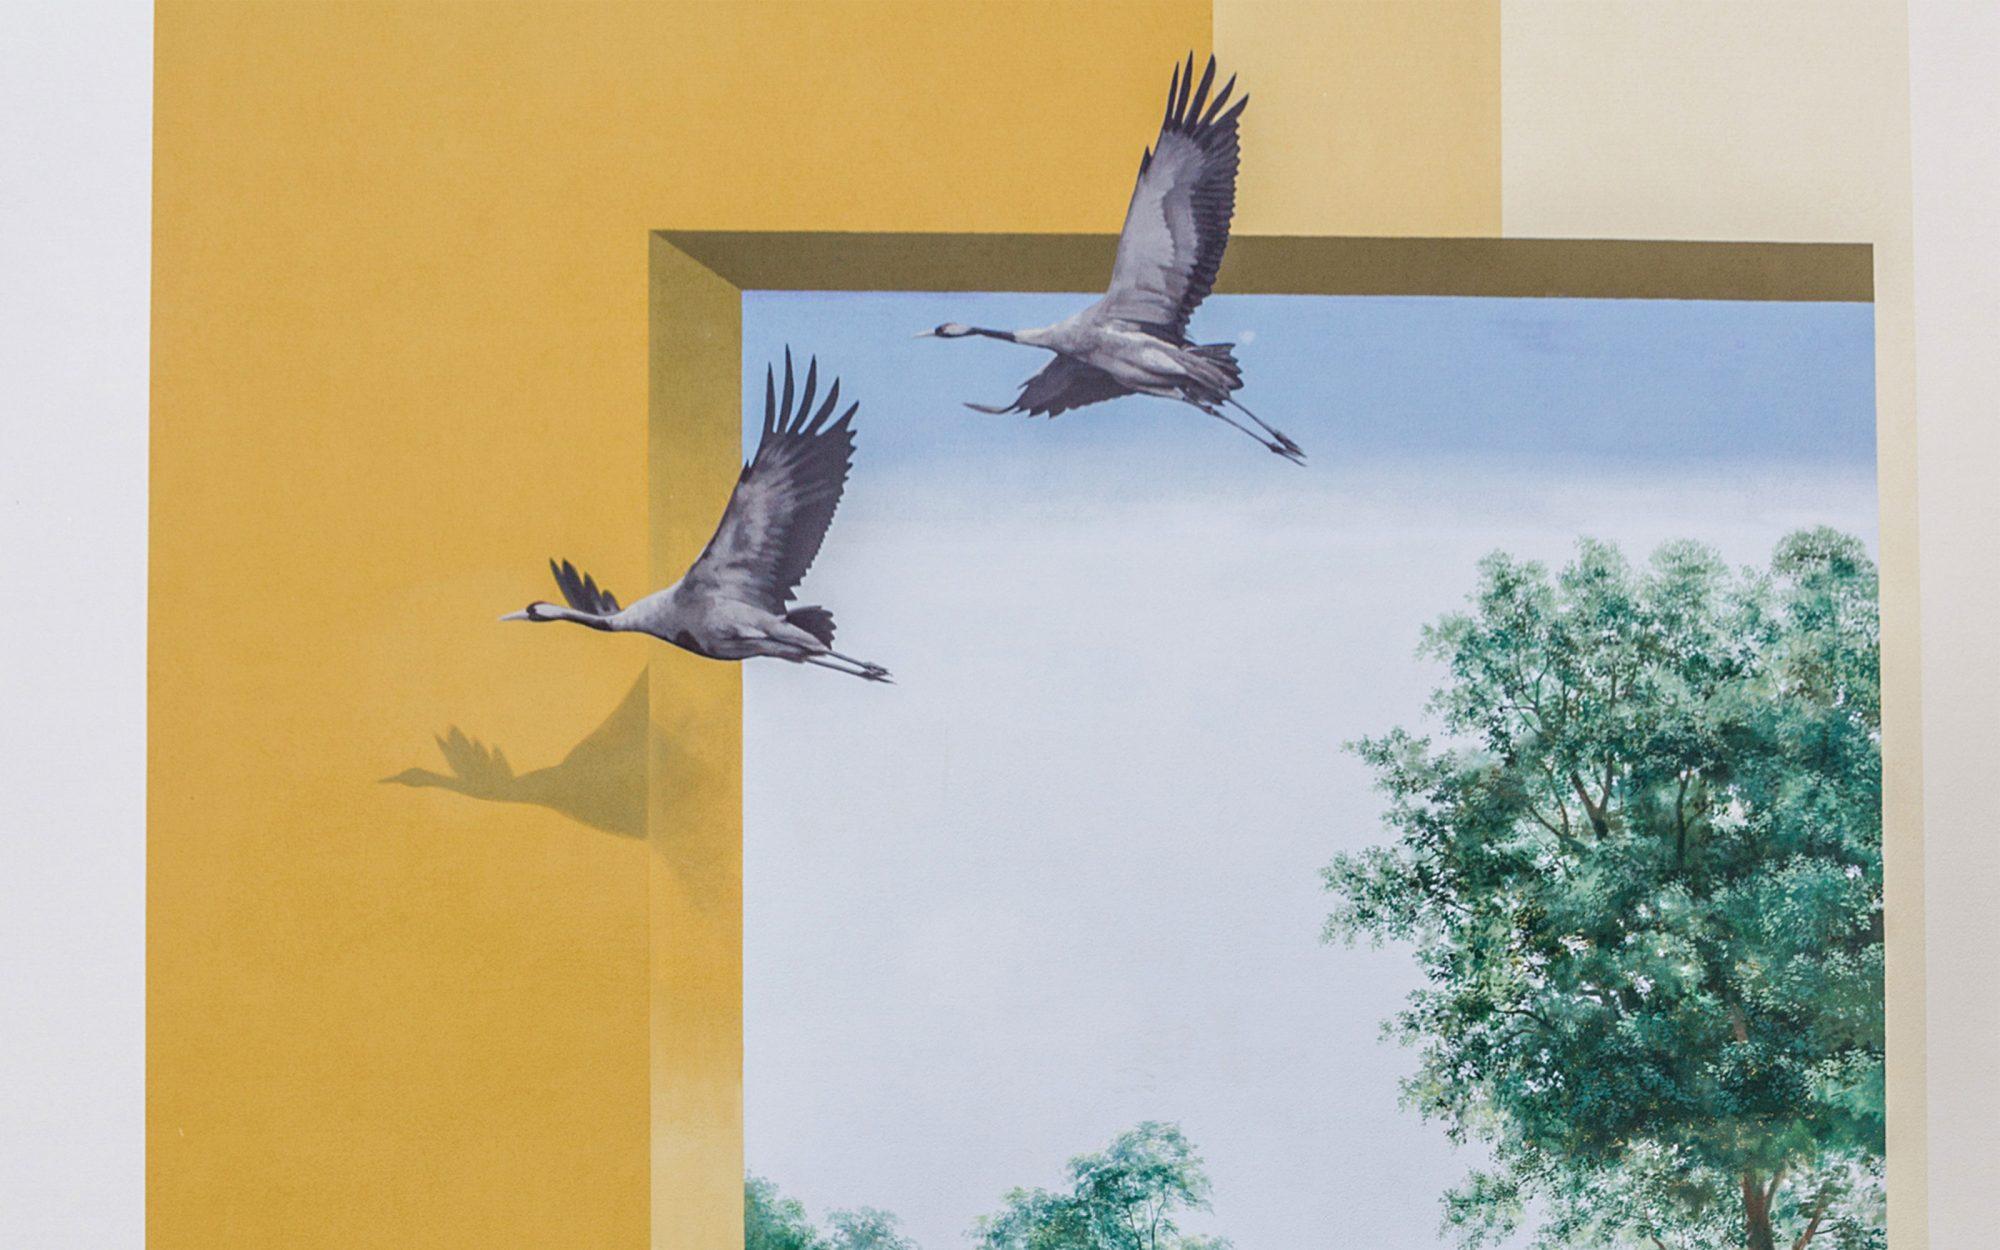 GRACO-Ketzin-Wandmalerei-Voegel-Himmel-Giebel